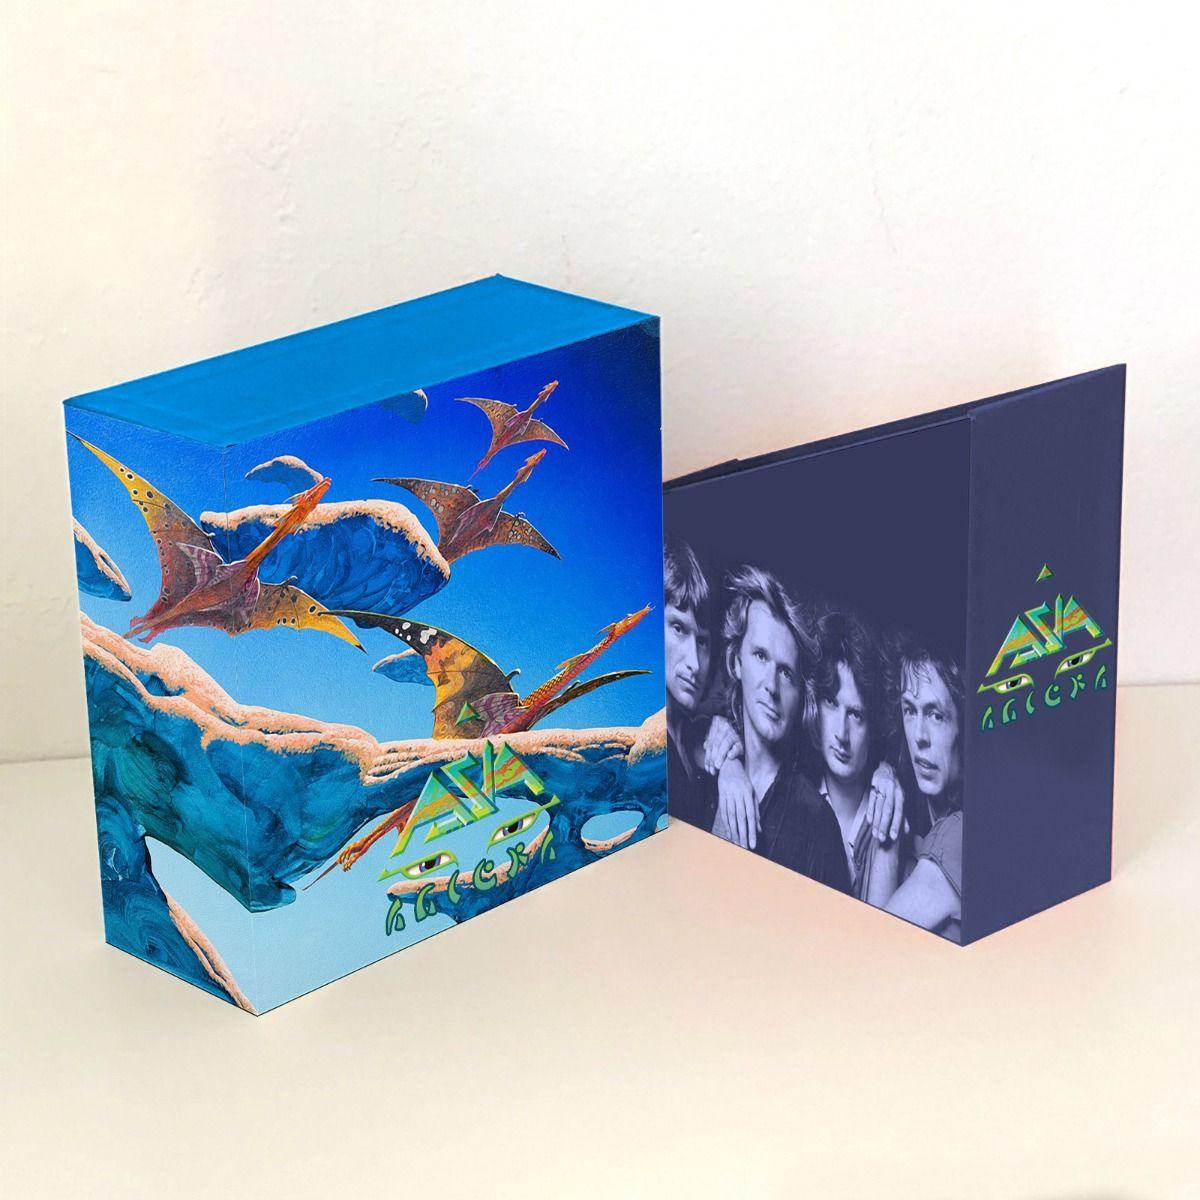 ASIA Promo Box